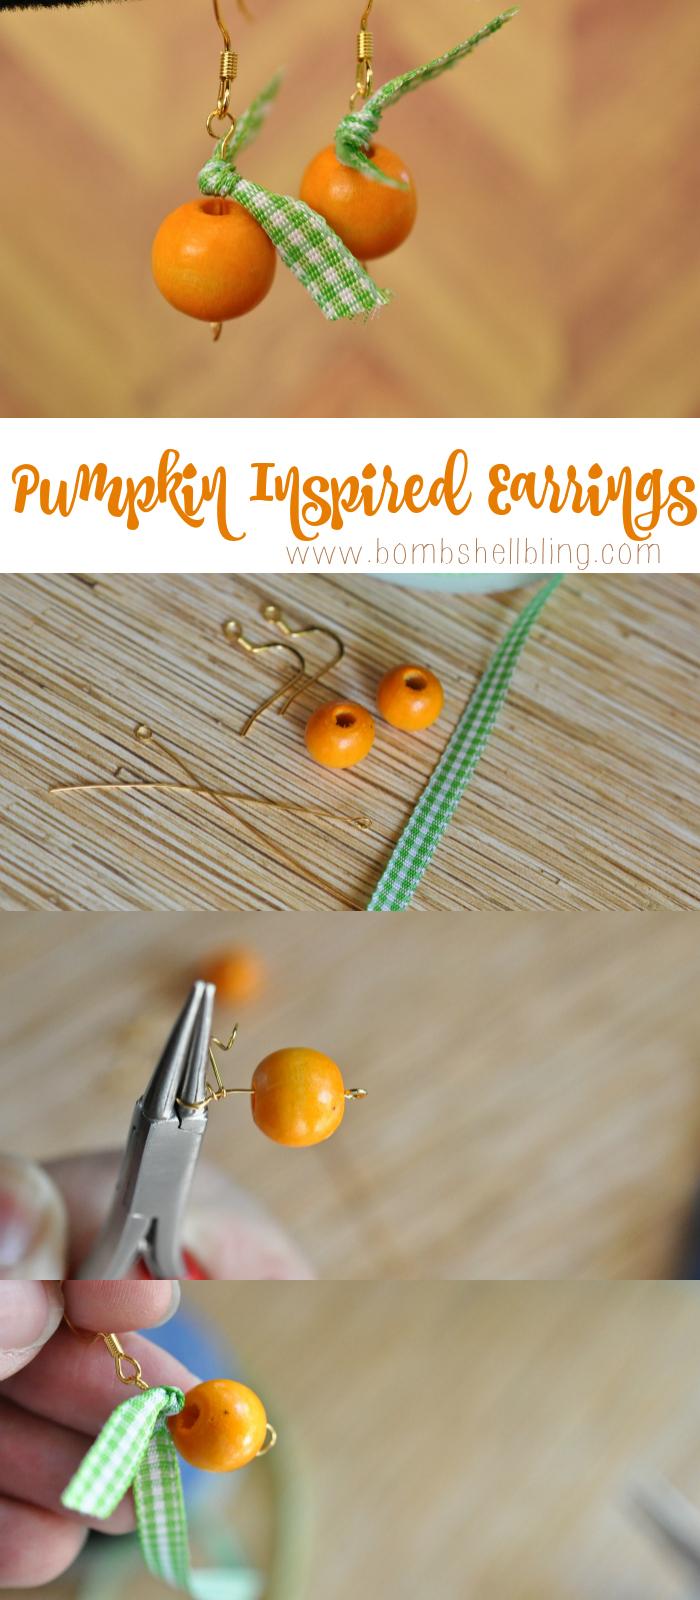 How to make pumpkin inspired earrings!